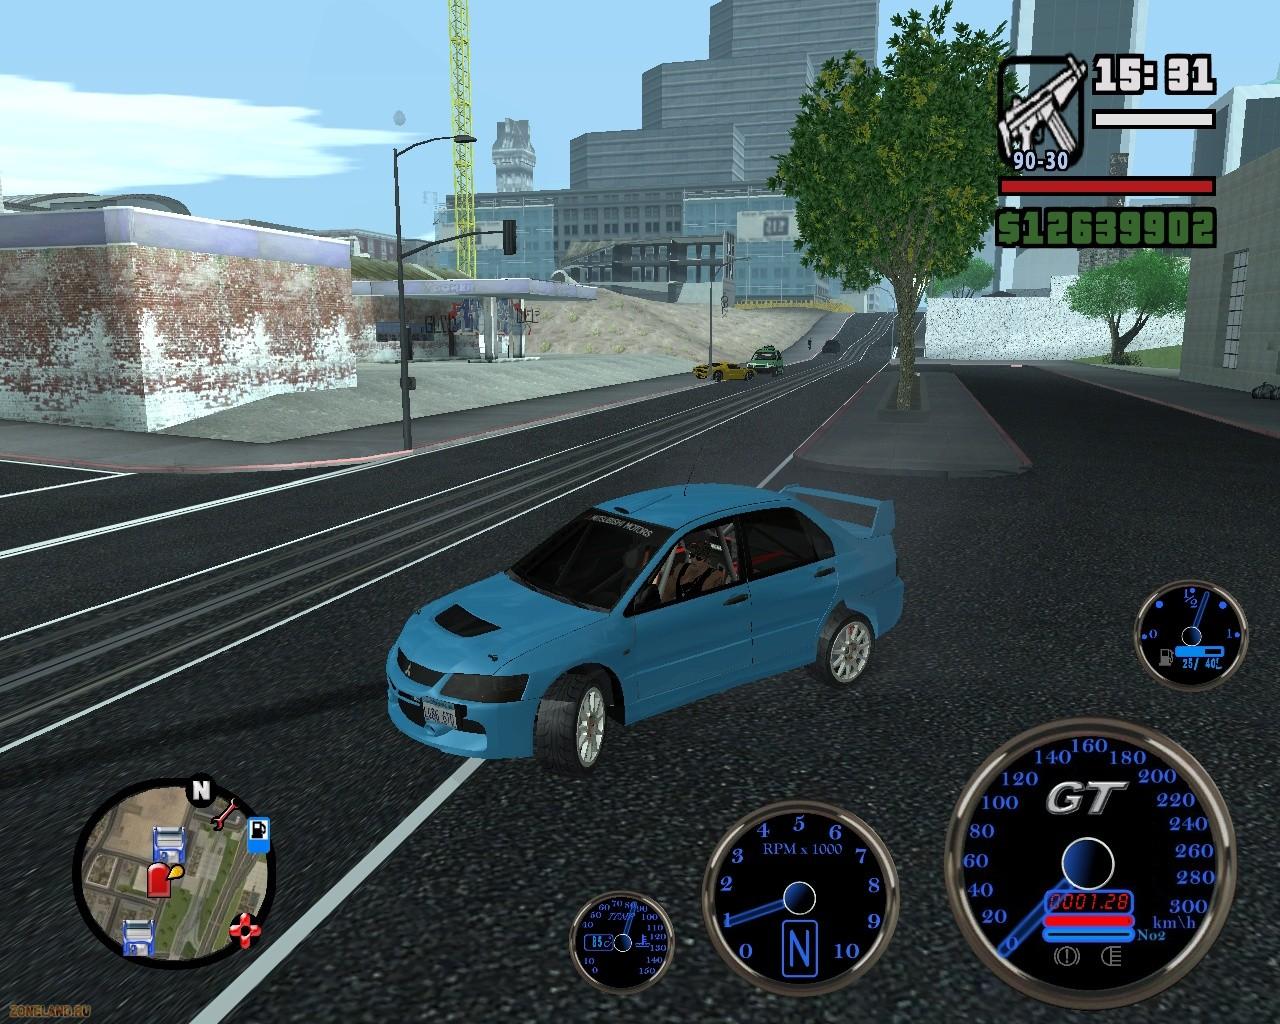 Gta San Andreas Super Cars скачать торрент